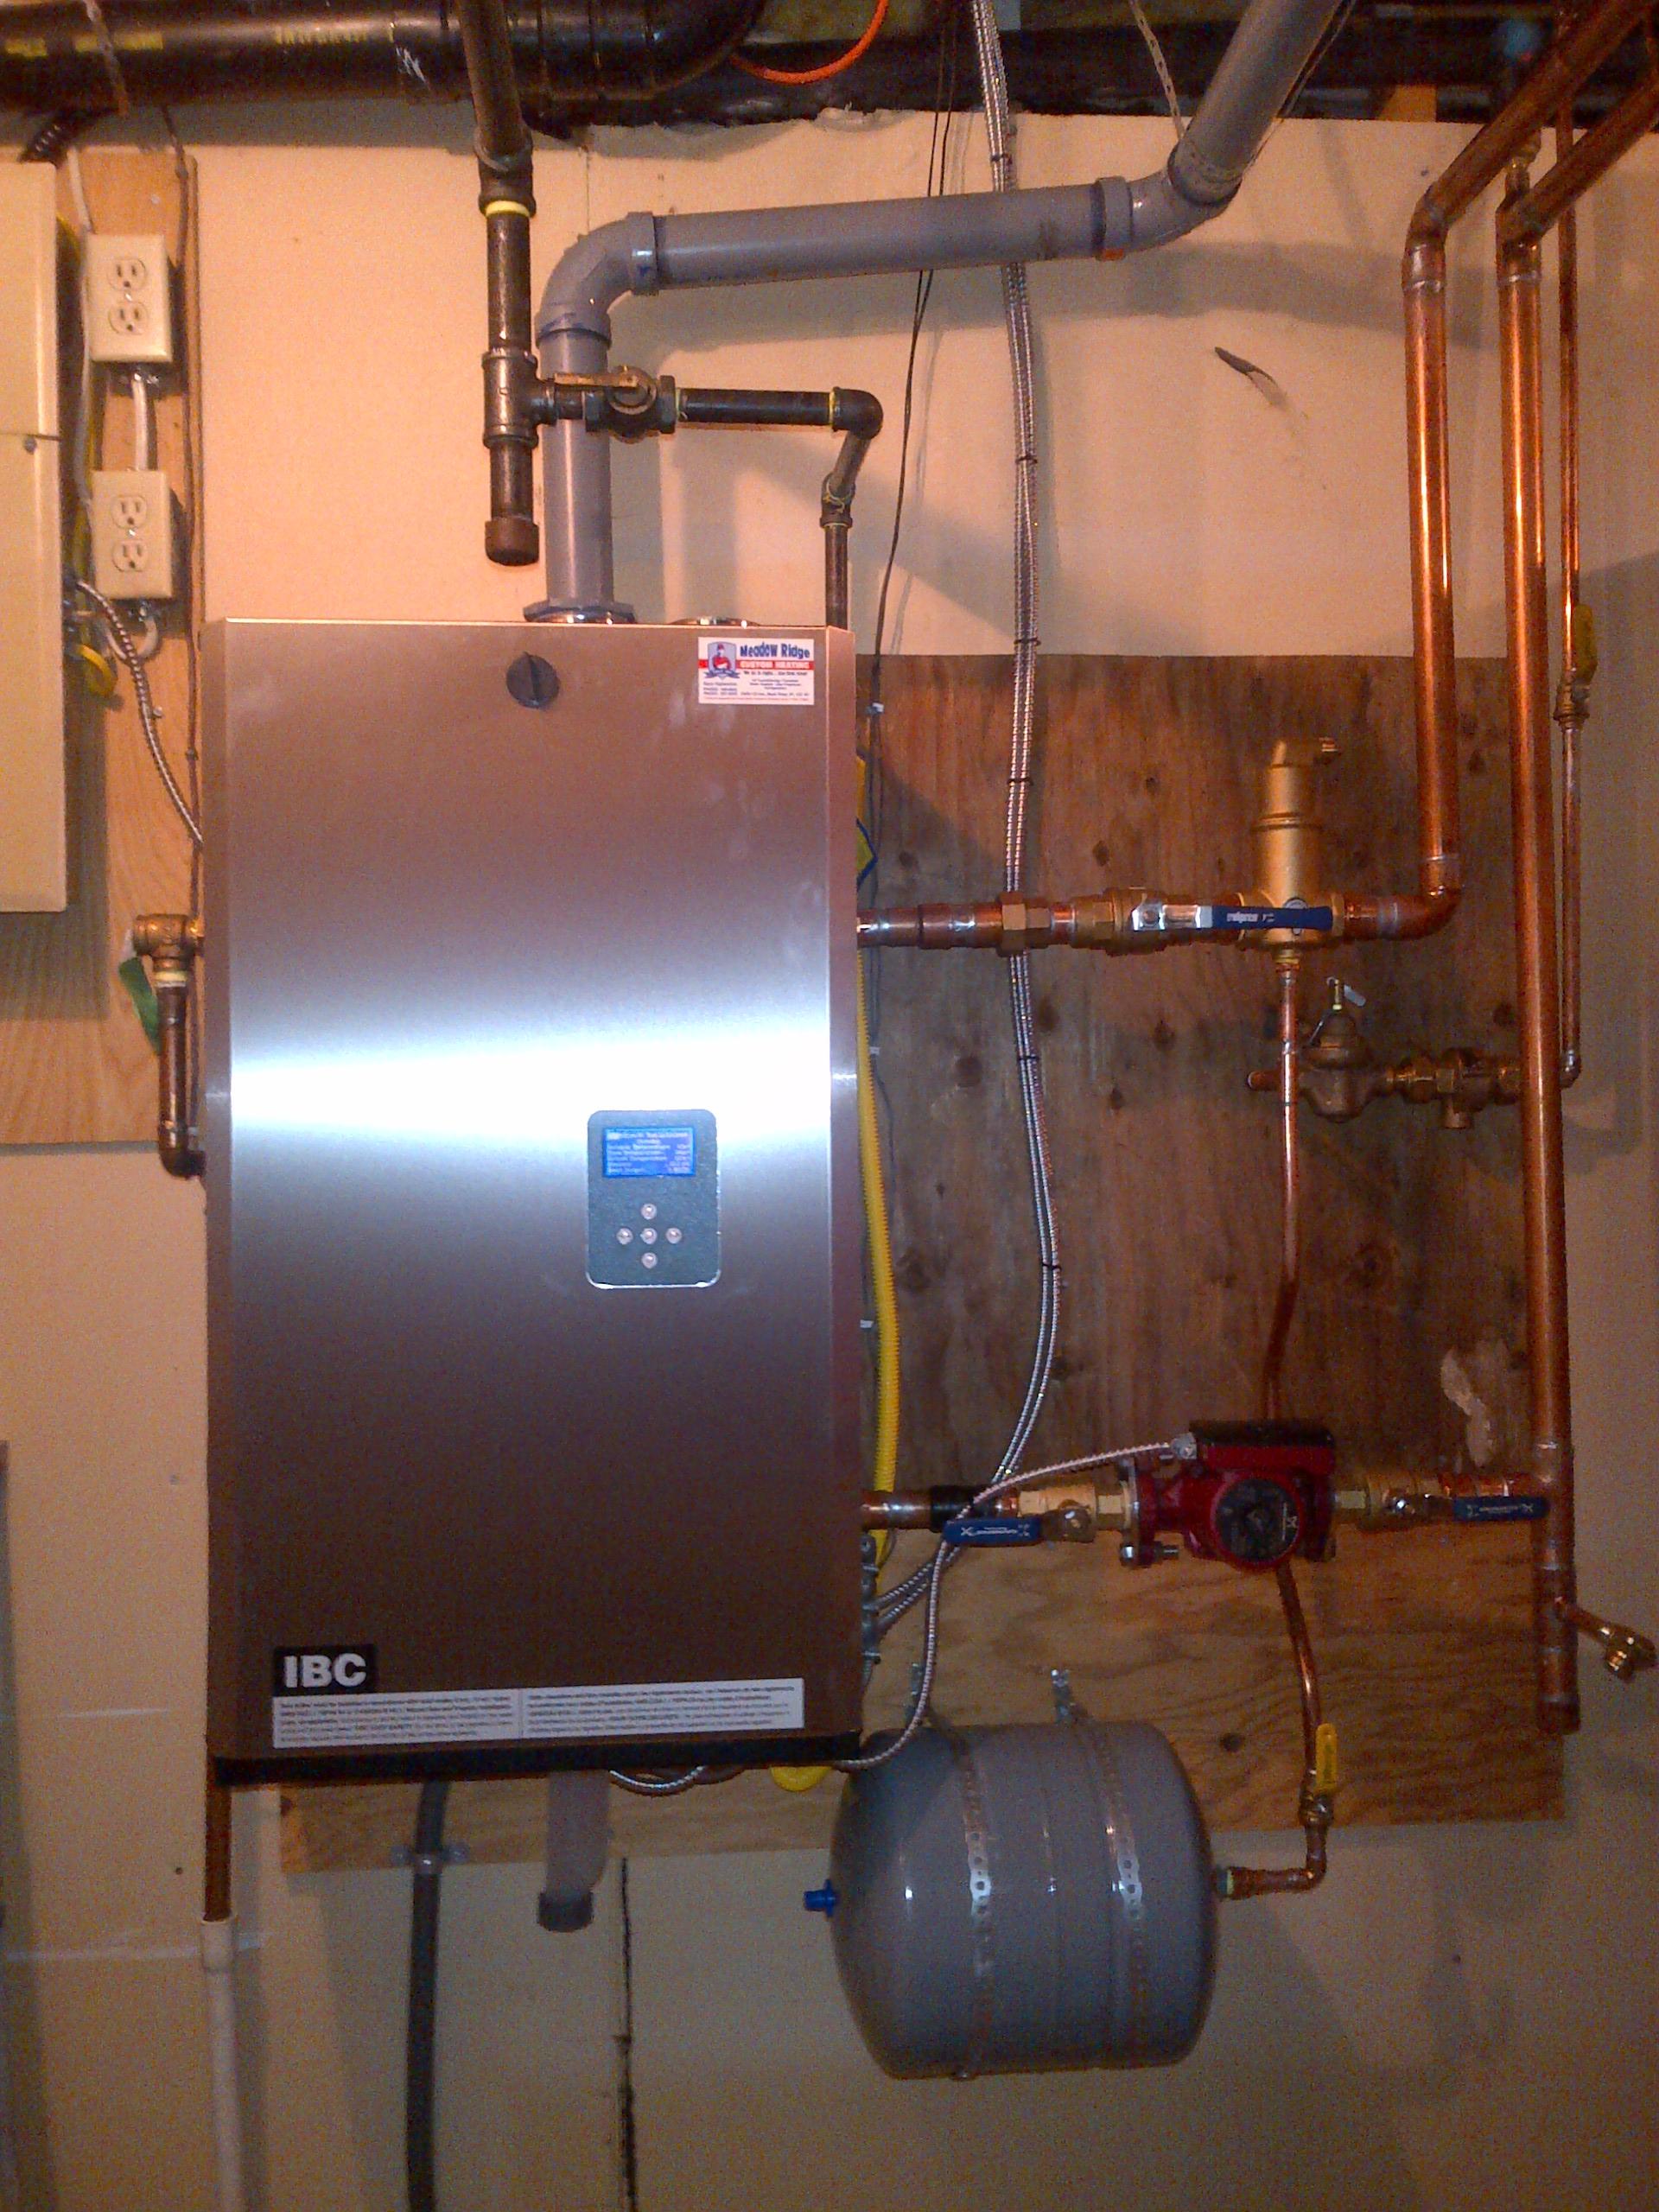 High Efficient Modulating Boiler Heat Pump Domestic Hot